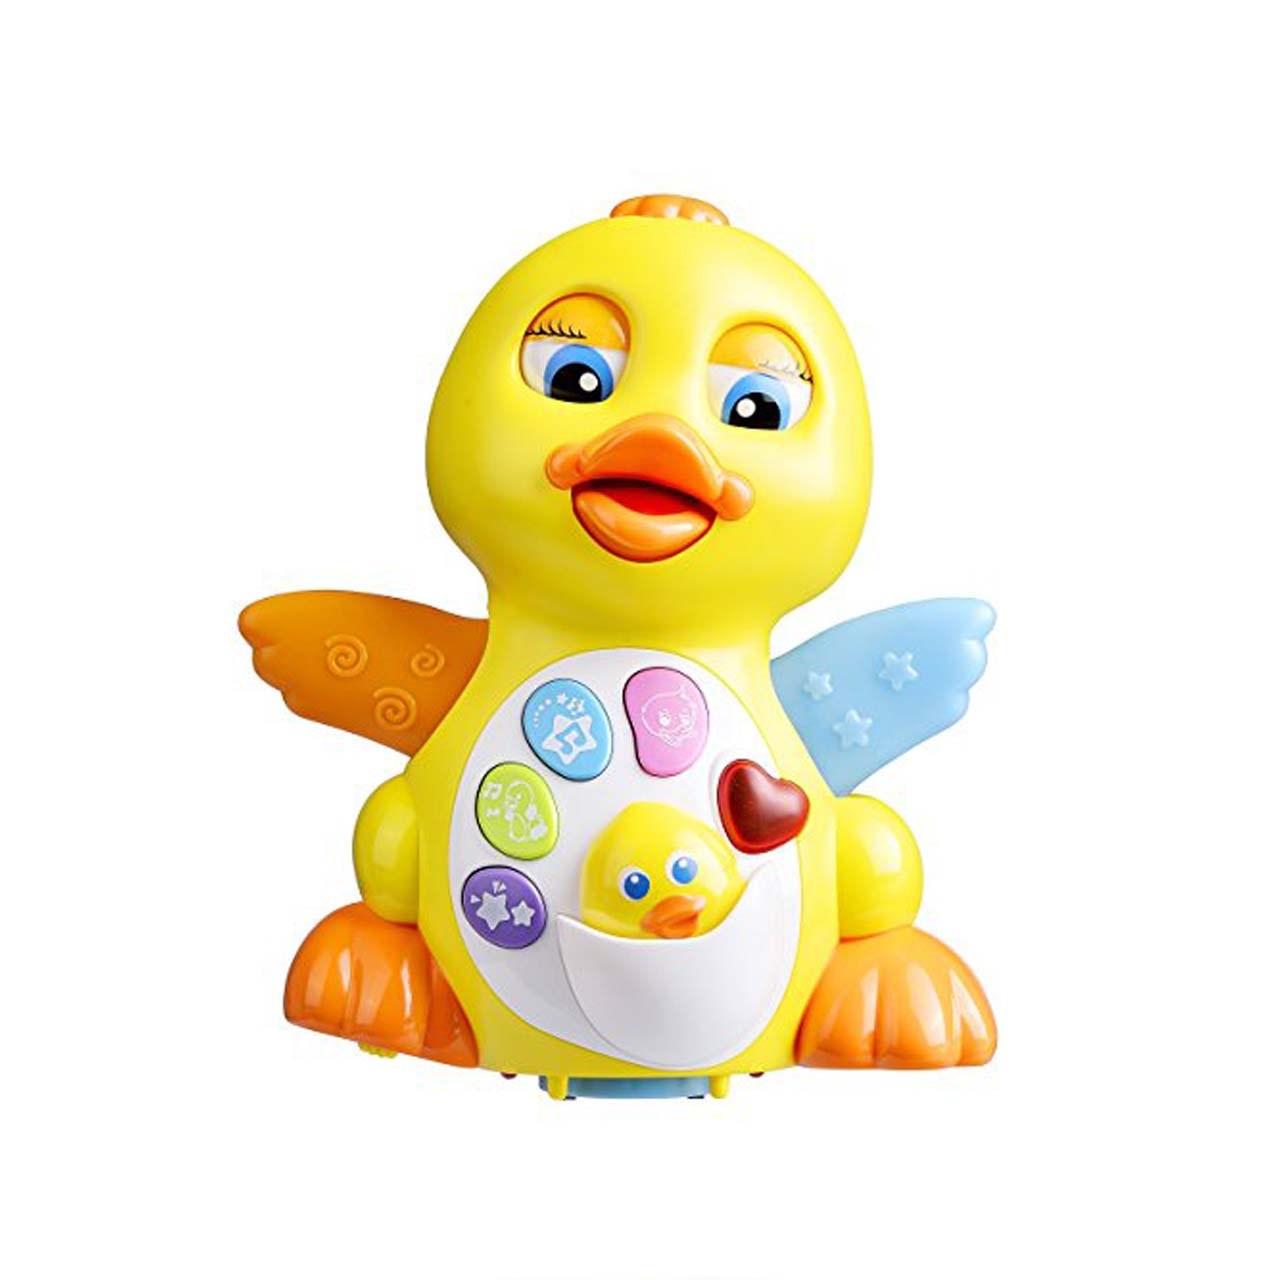 اسباب بازی موزیکال اردک هیلی مدل  808